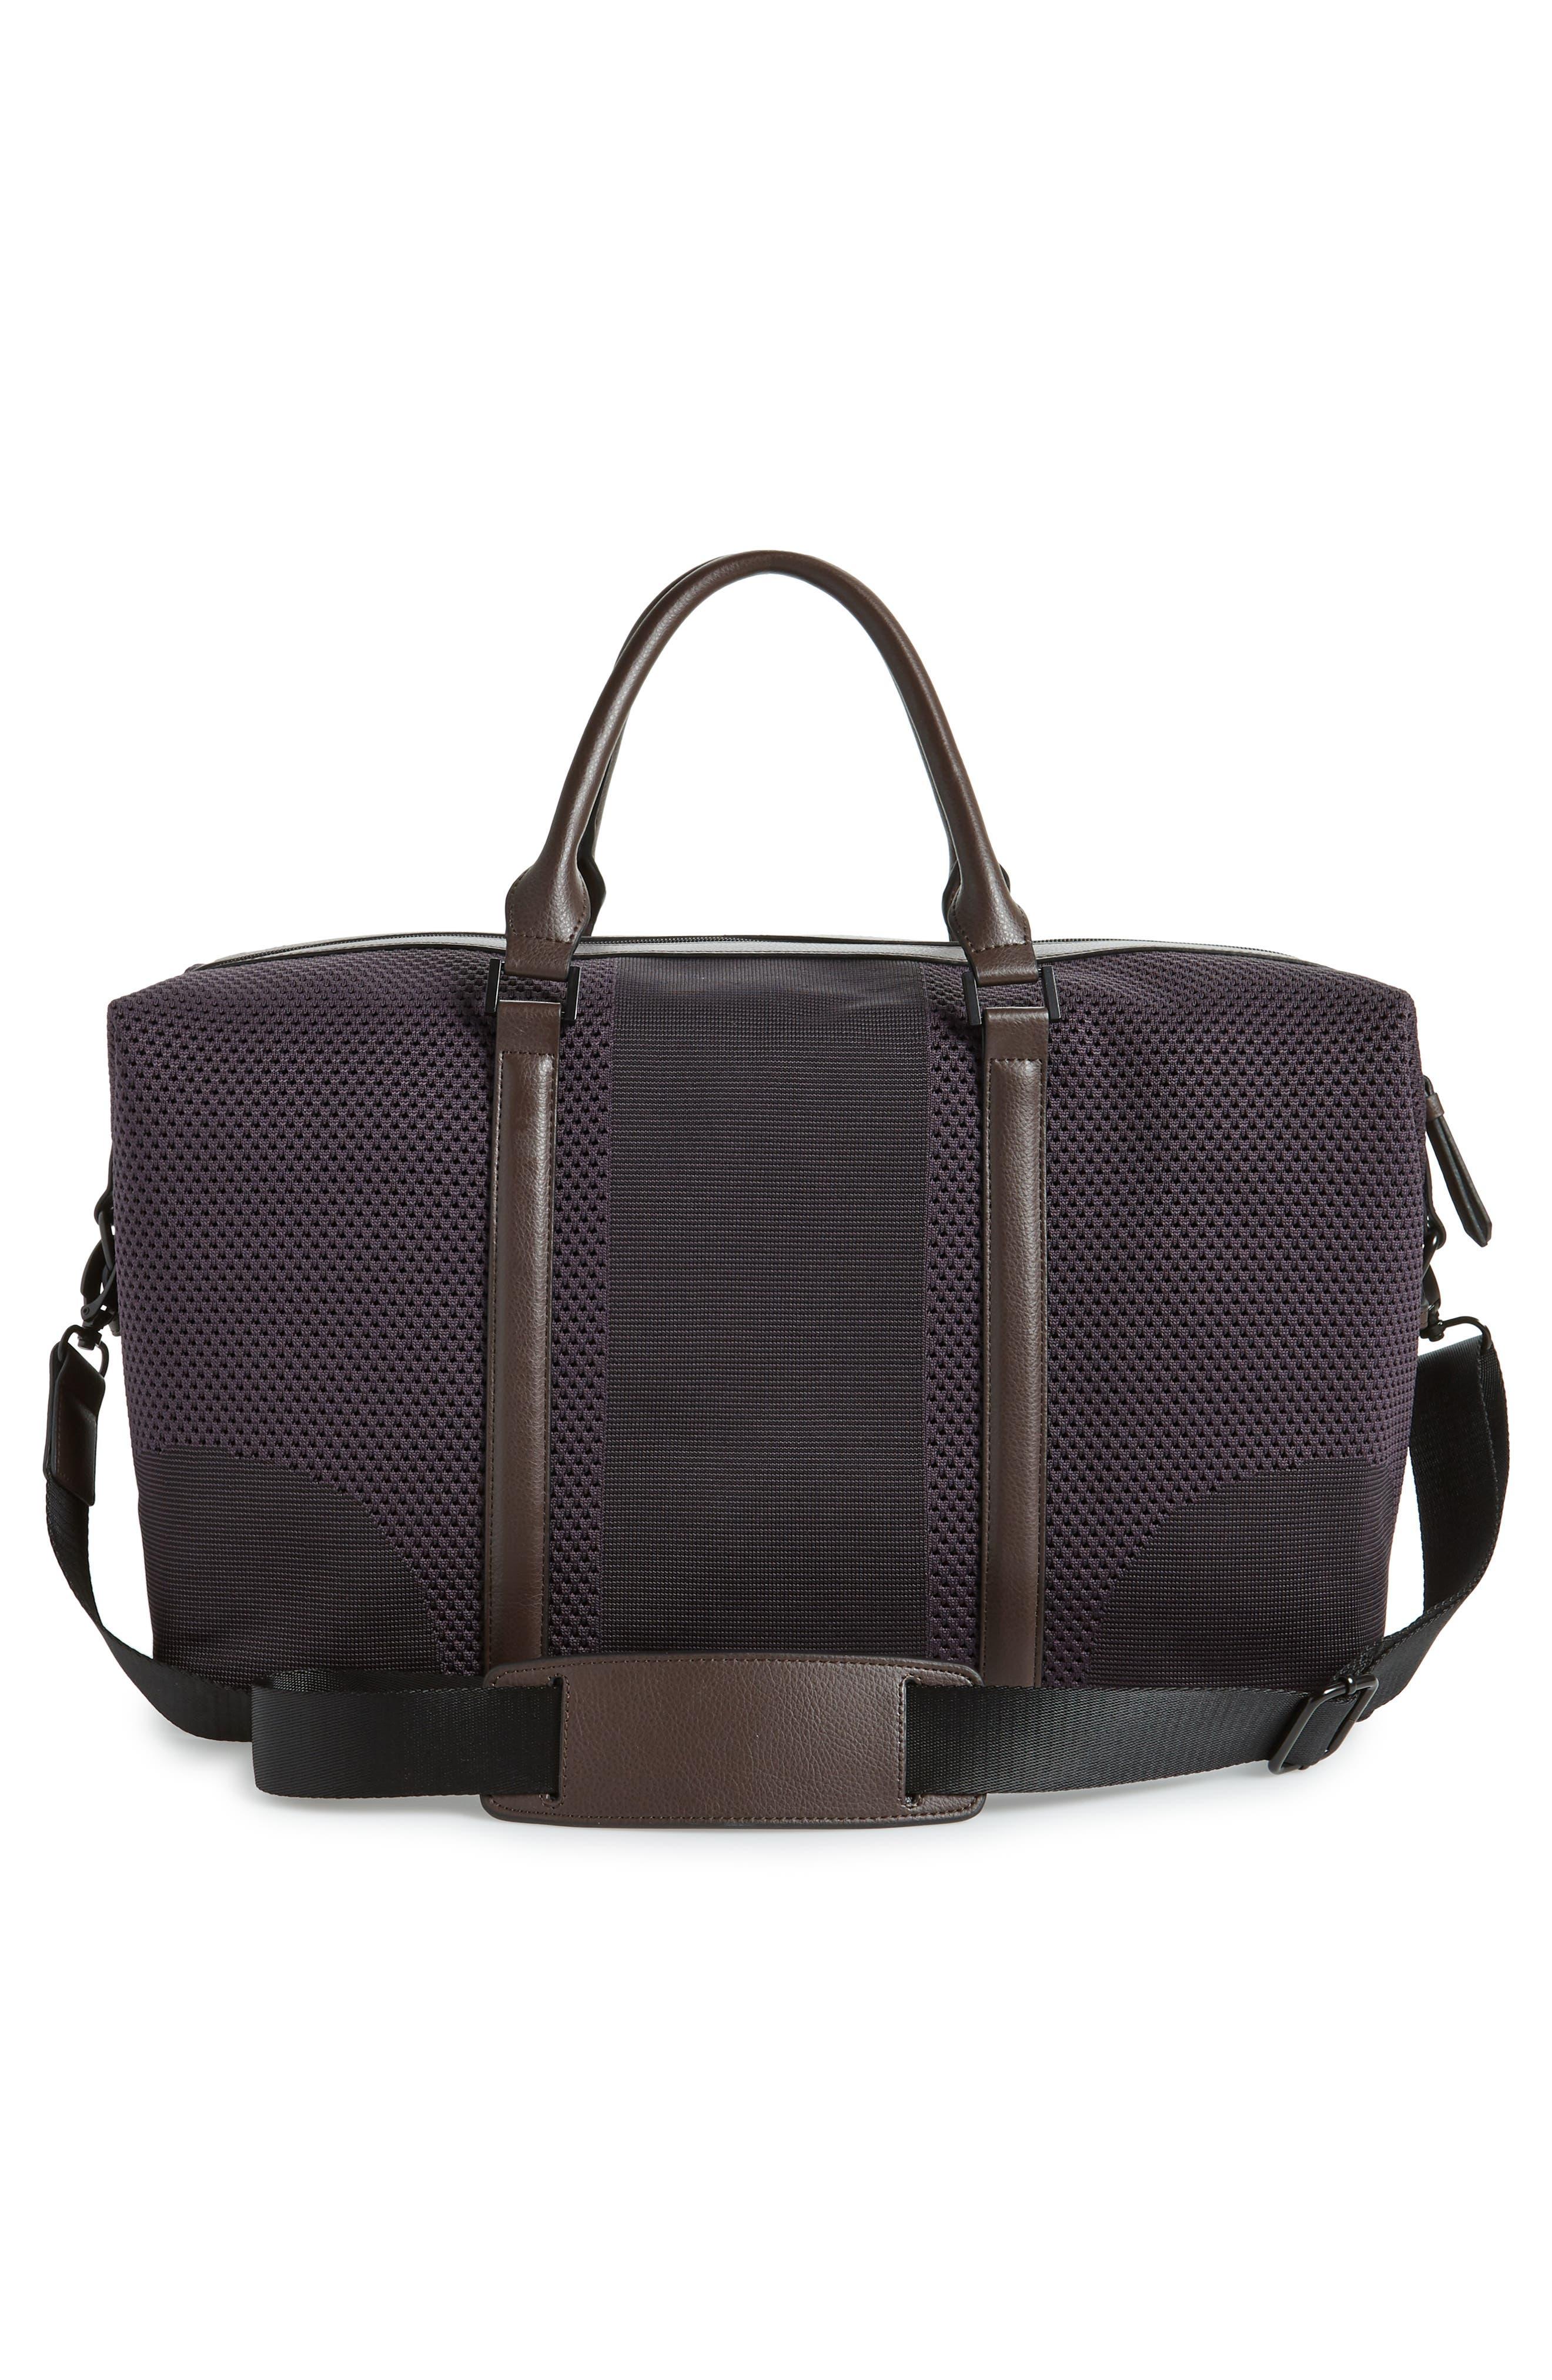 TED BAKER LONDON,                             Knit Holdall Duffel Bag,                             Alternate thumbnail 3, color,                             531